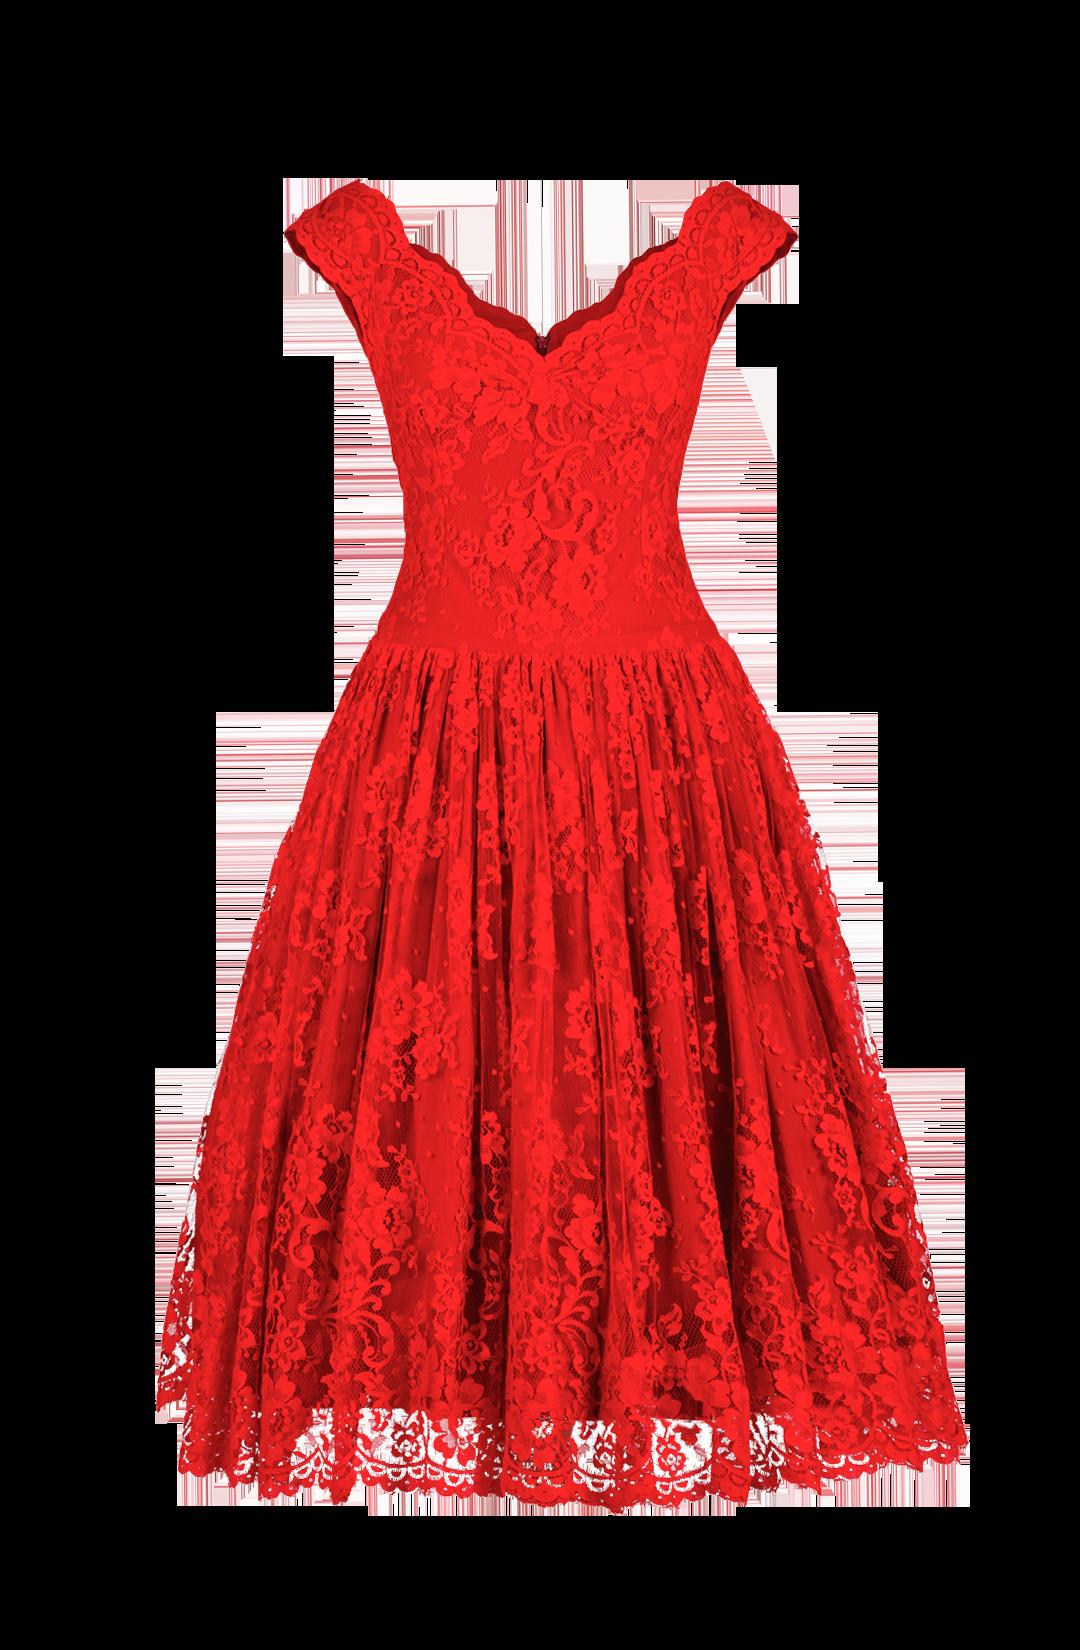 lena hoschek online shop | fancy dresses, dresses, vintage